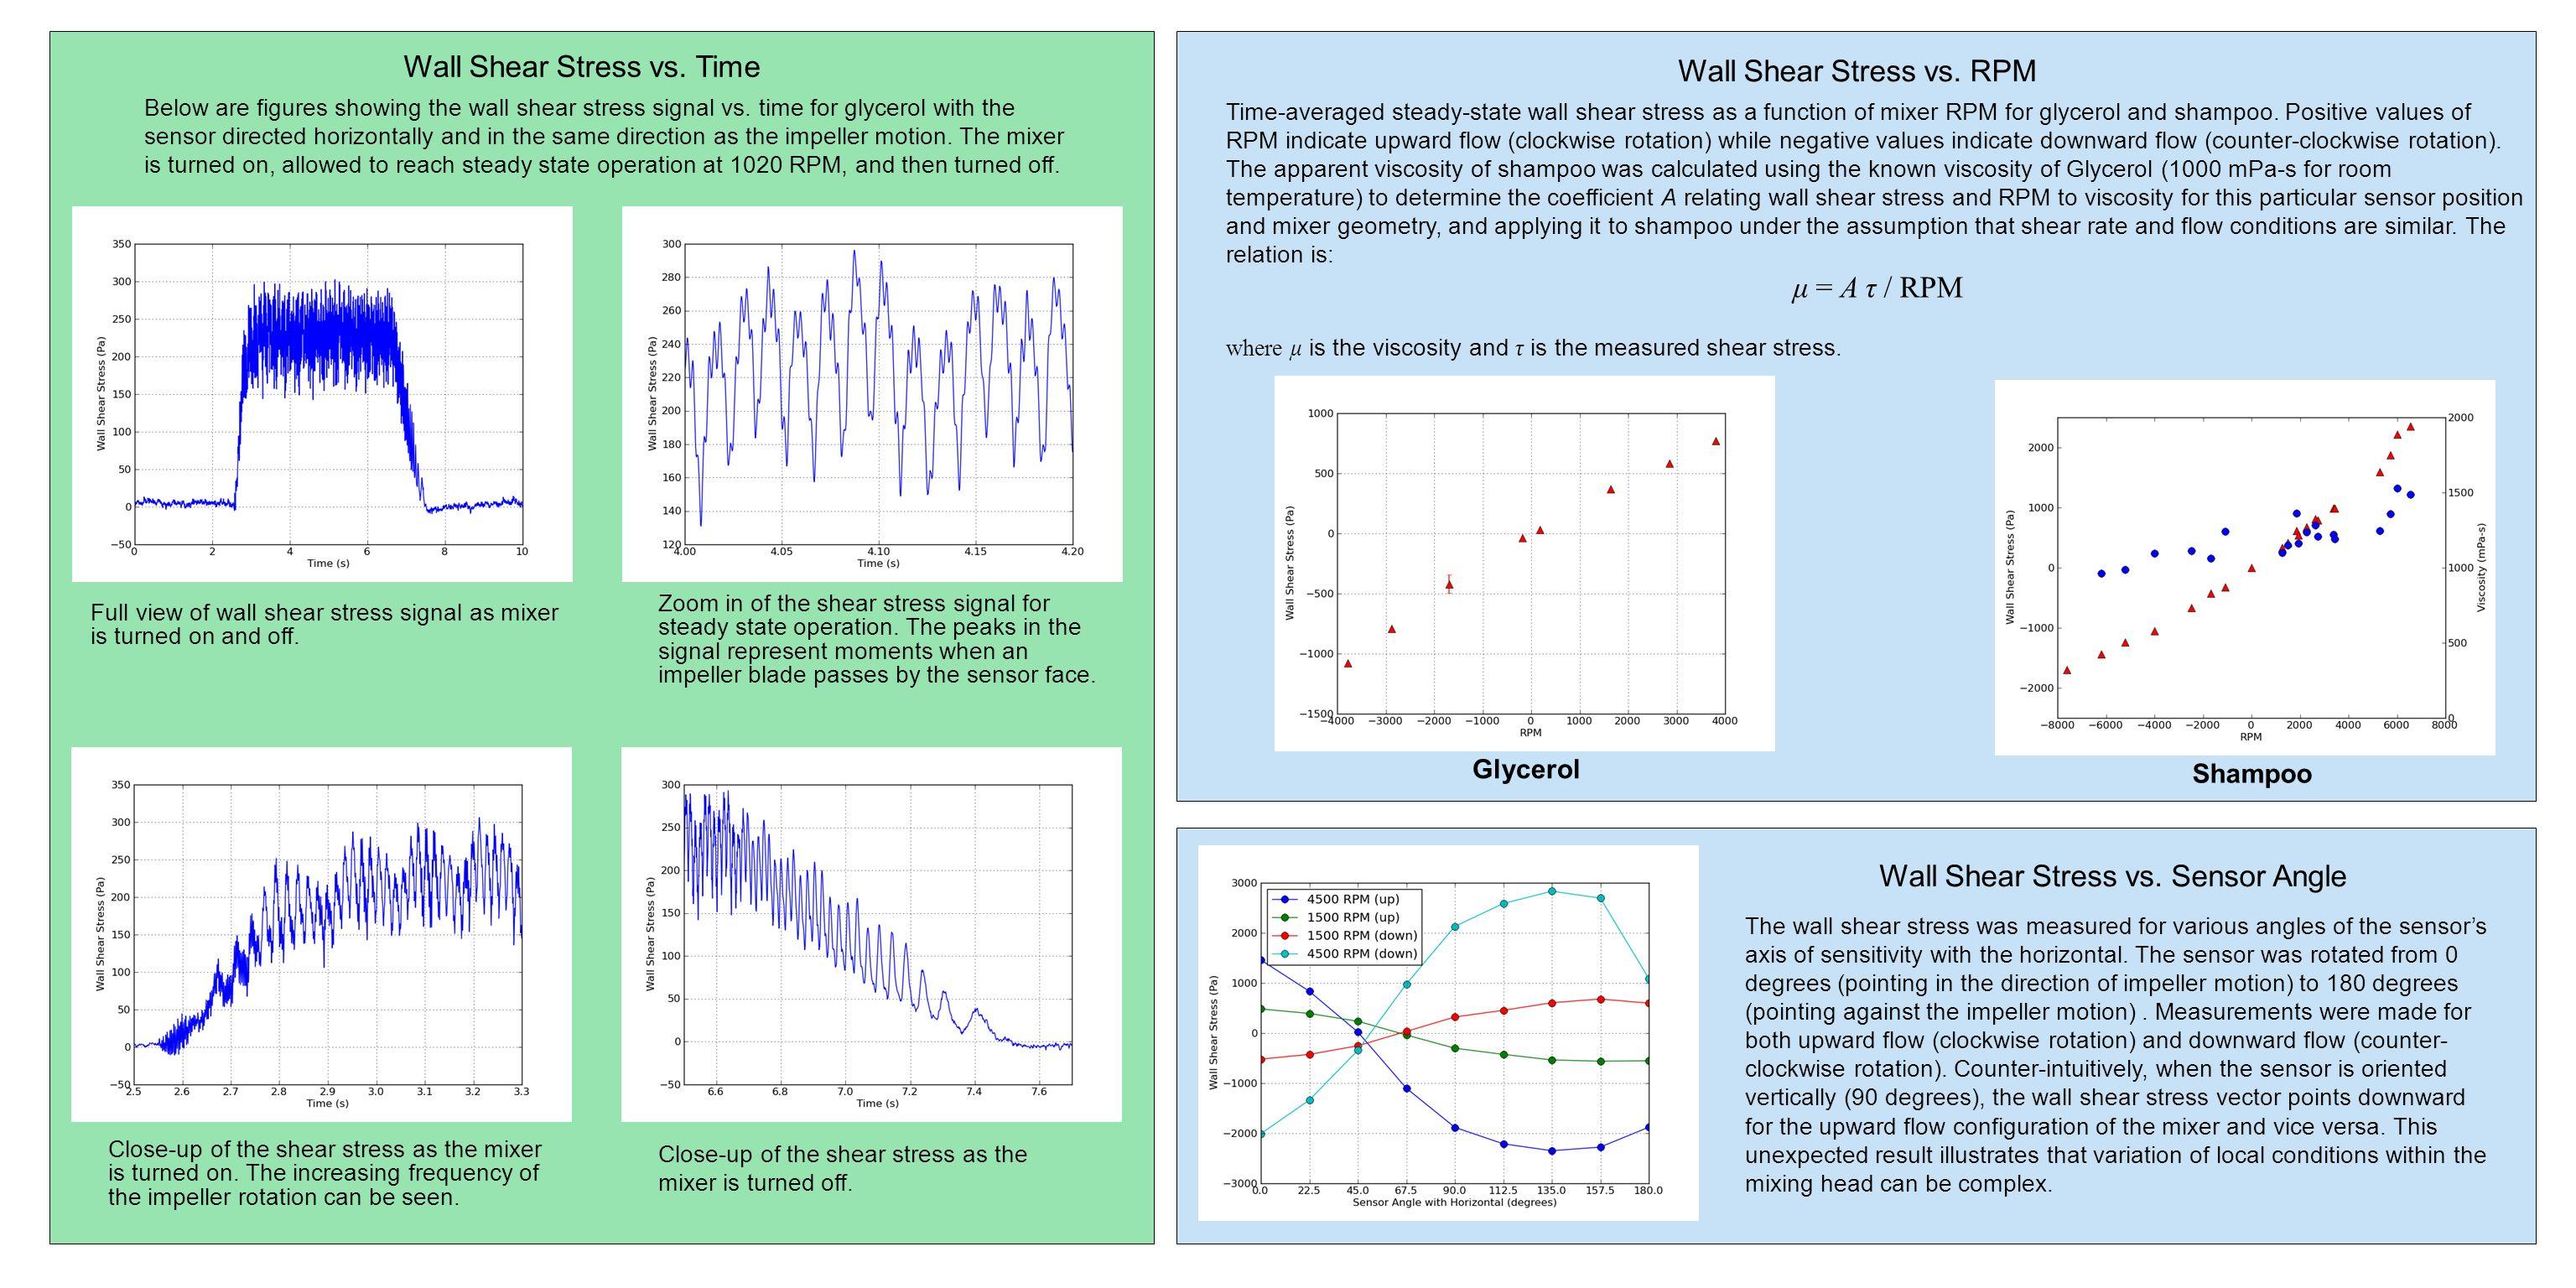 Wall Shear Stress vs. Time Wall Shear Stress vs. RPM